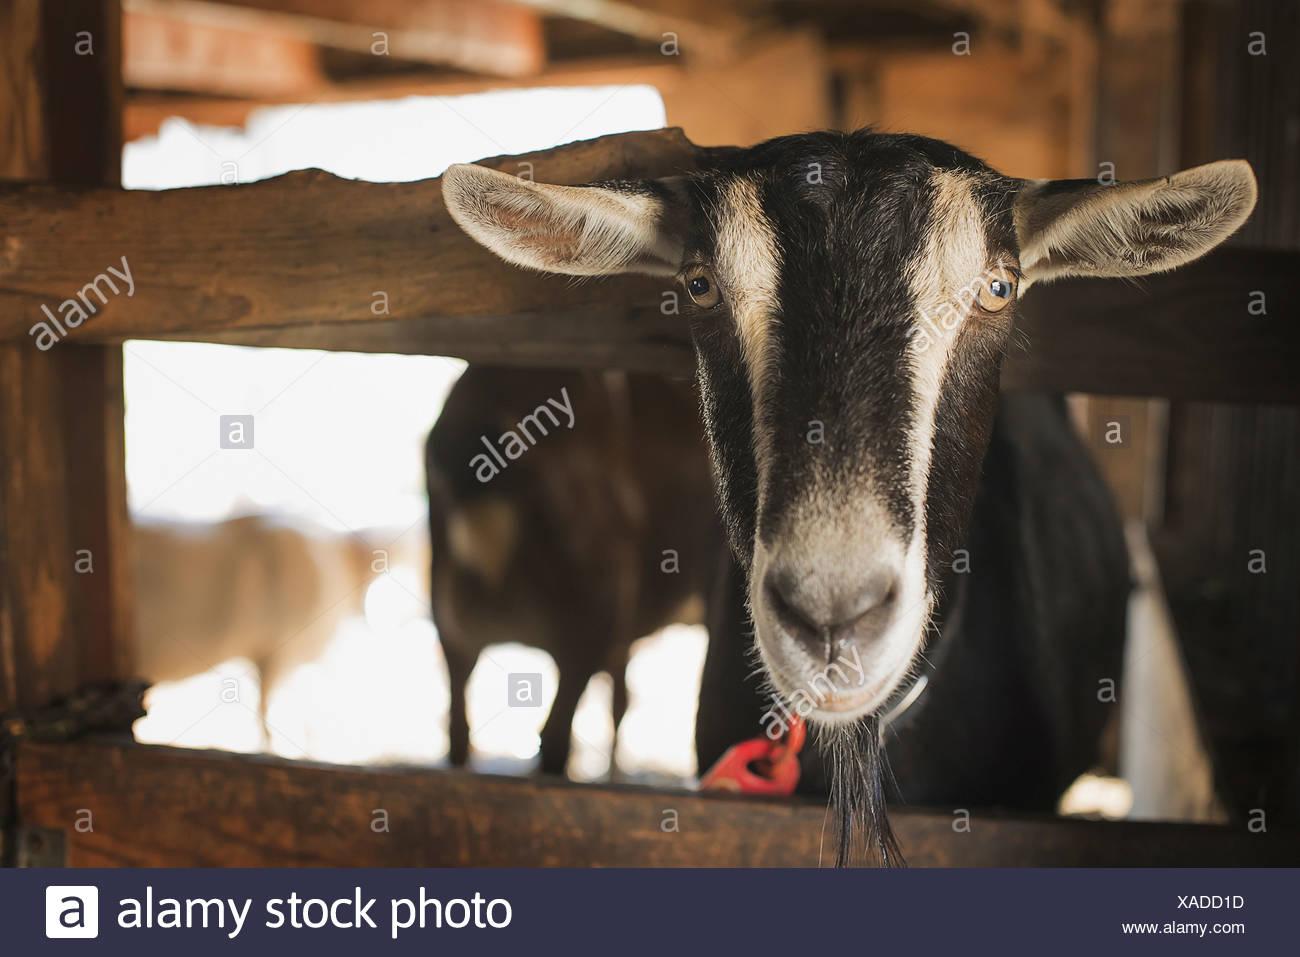 Un animale da azienda su di una azienda agricola biologica di una capra in una penna Immagini Stock